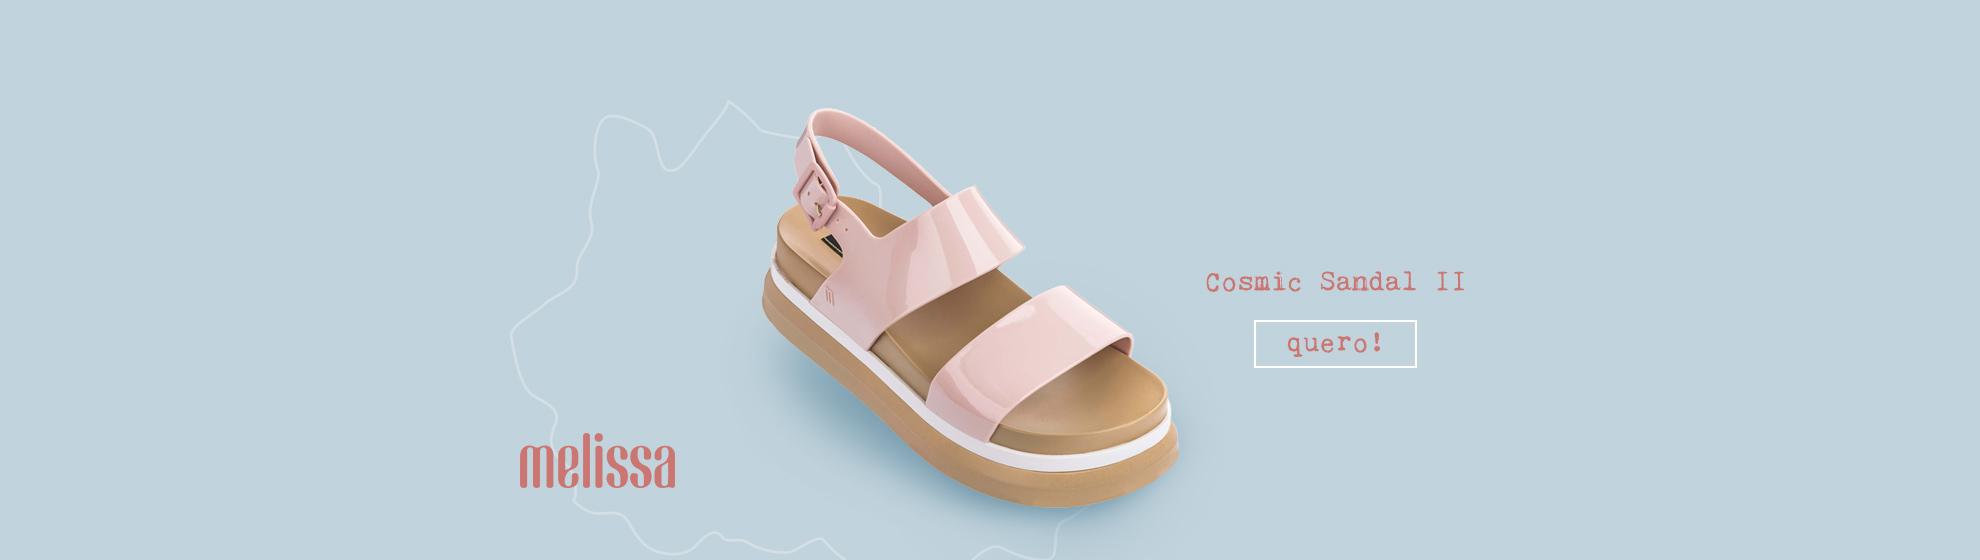 Cosmic Sandal